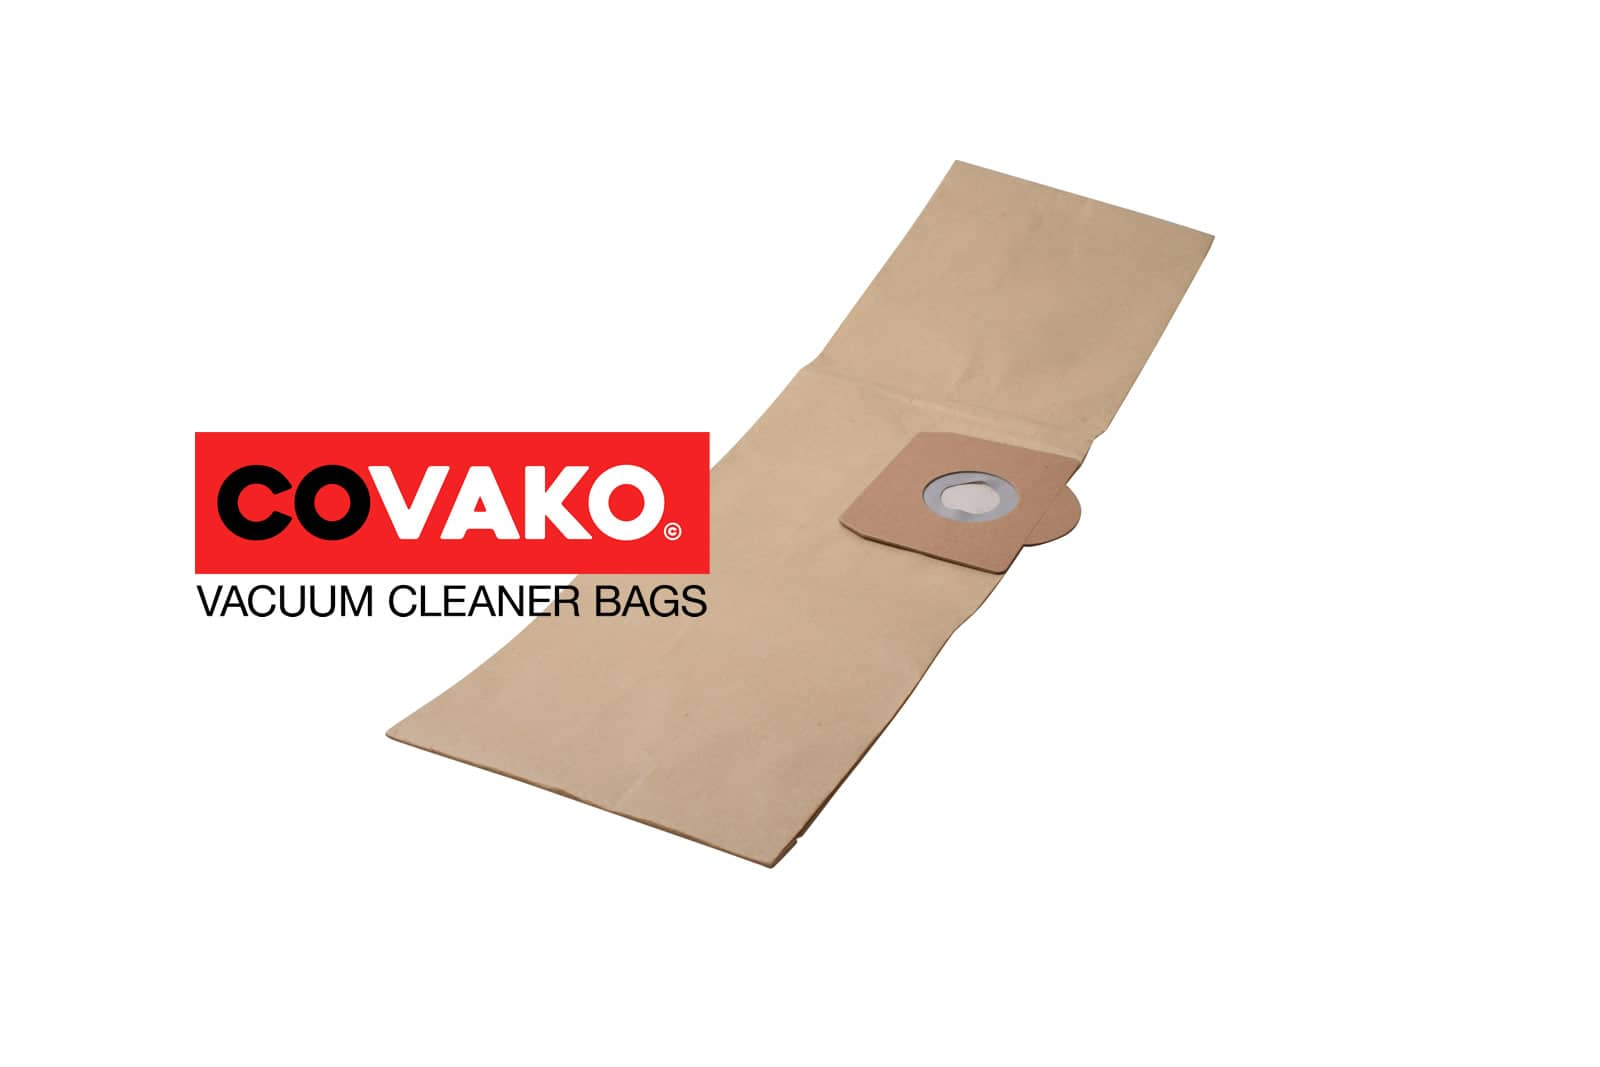 Lavor Sahara / Paper - Lavor vacuum cleaner bags